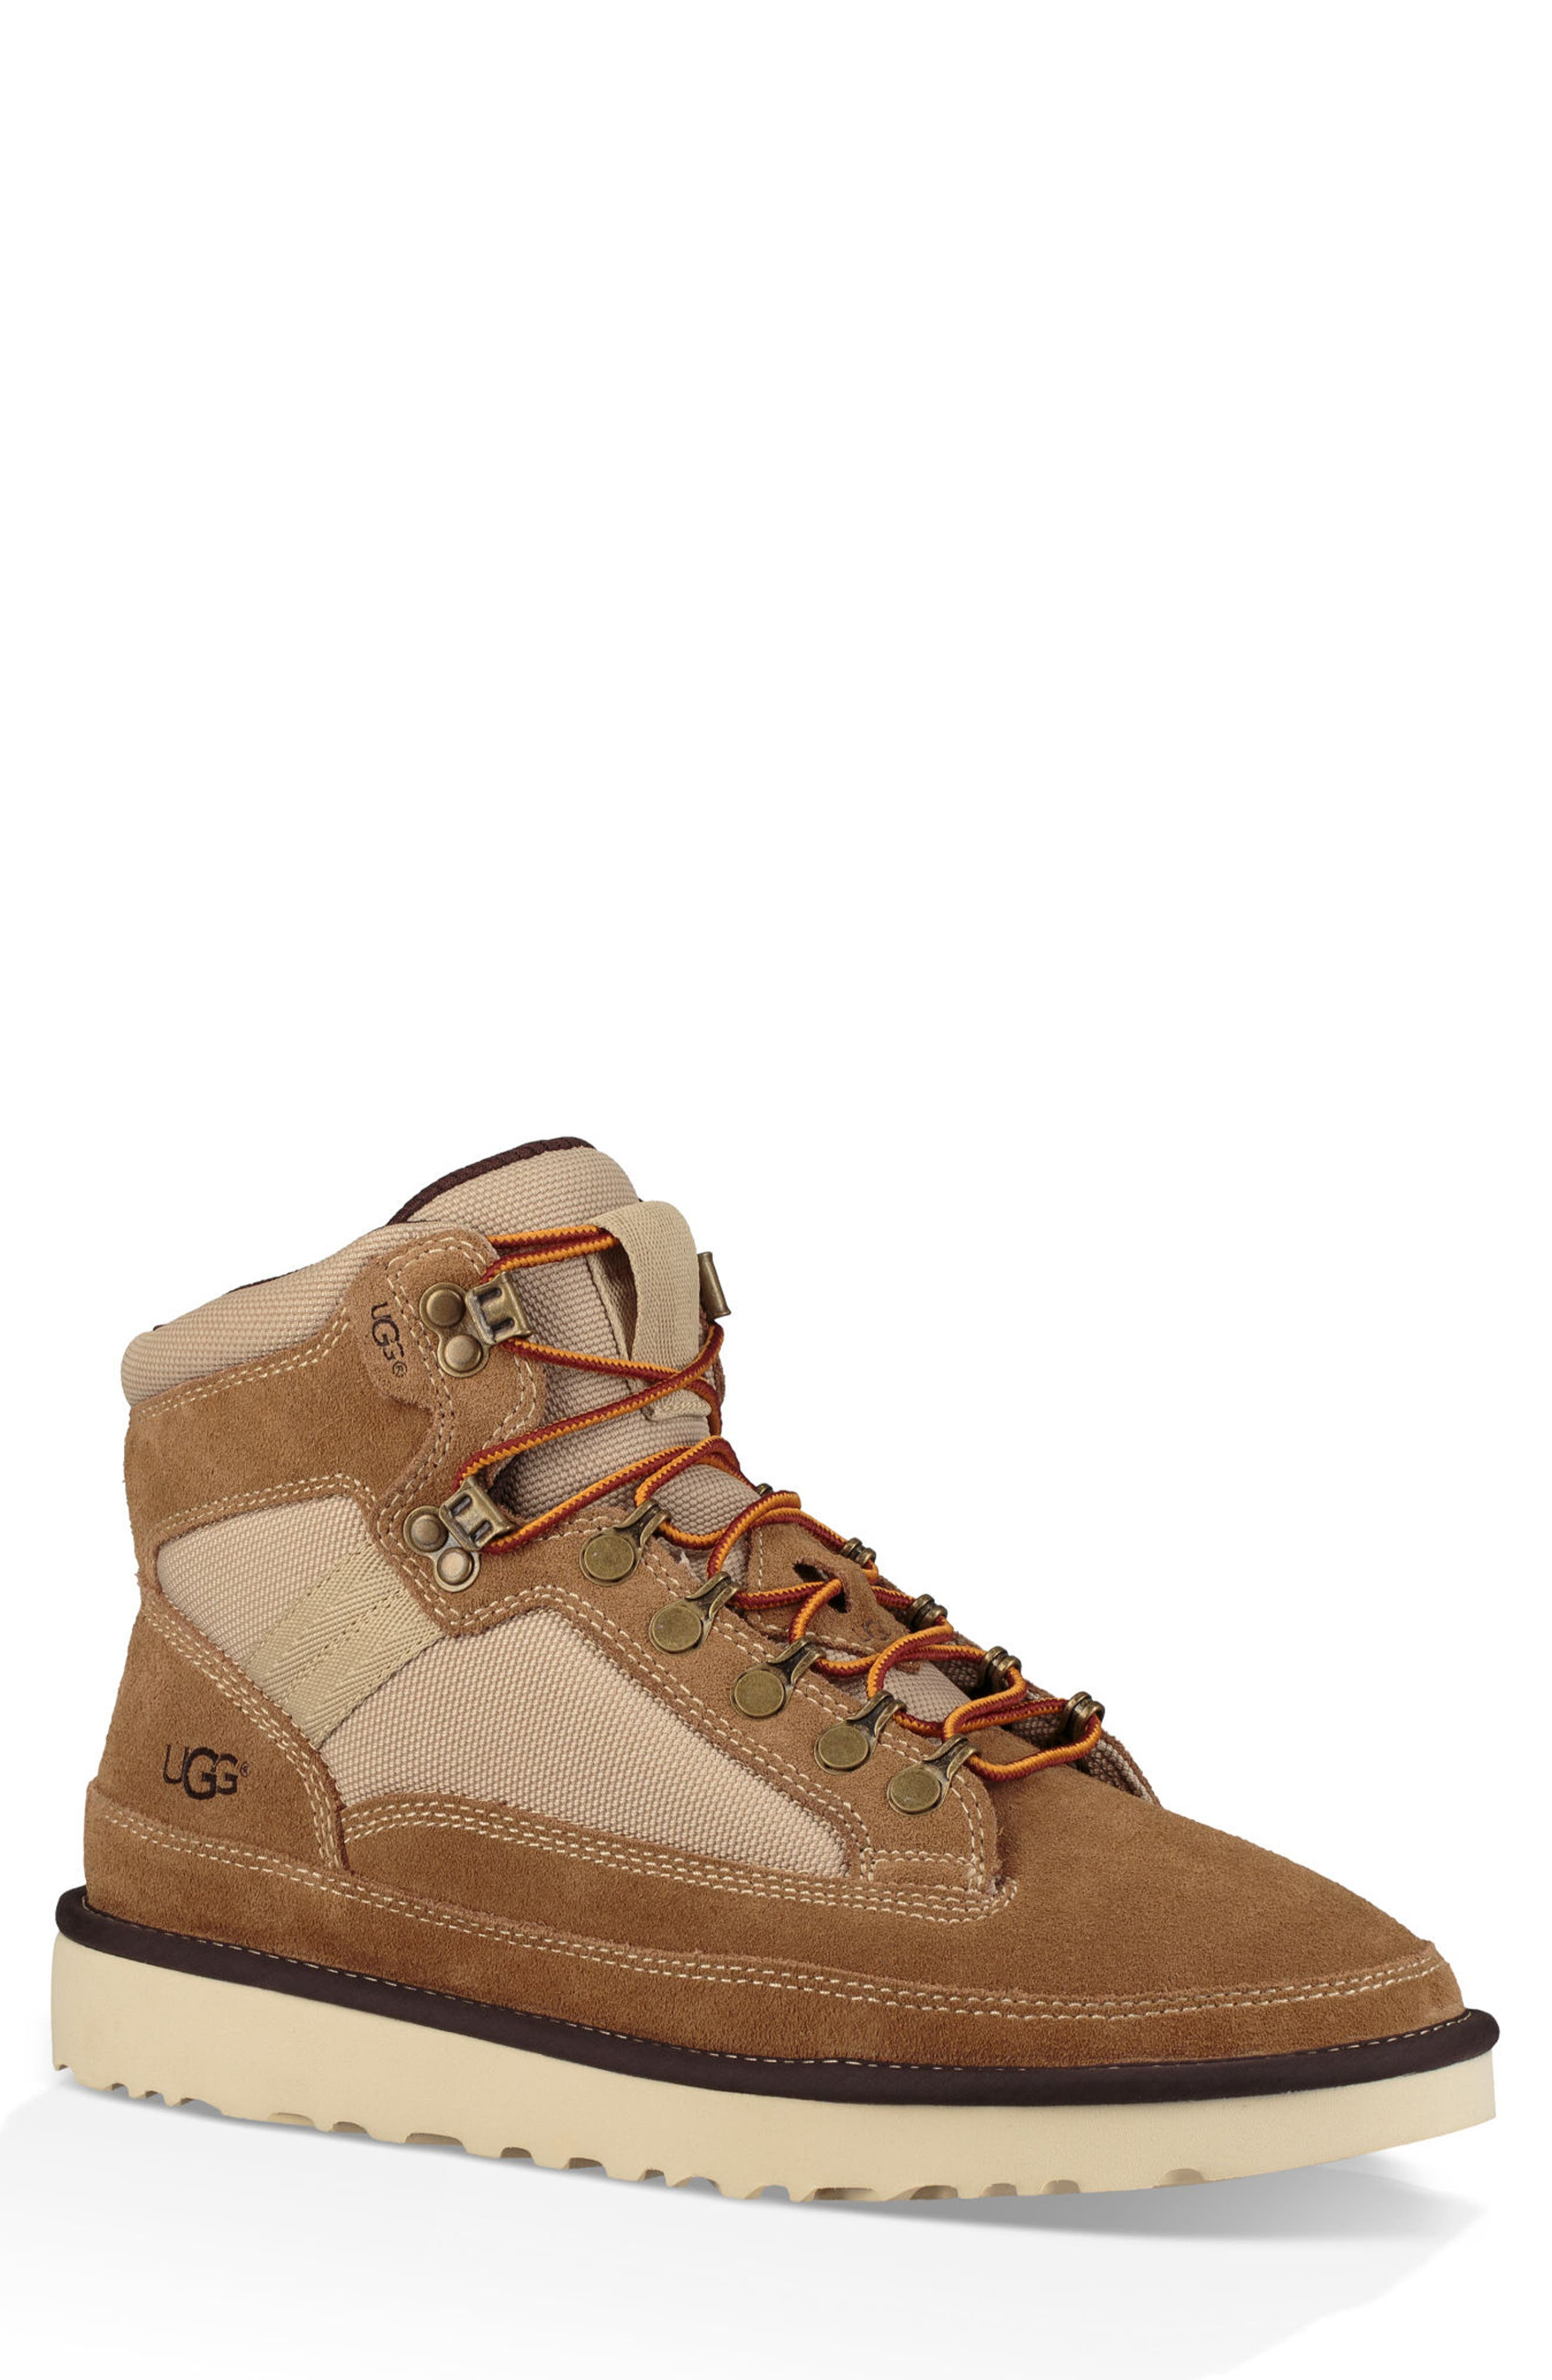 Ugg Highland Hiker Boot, Brown